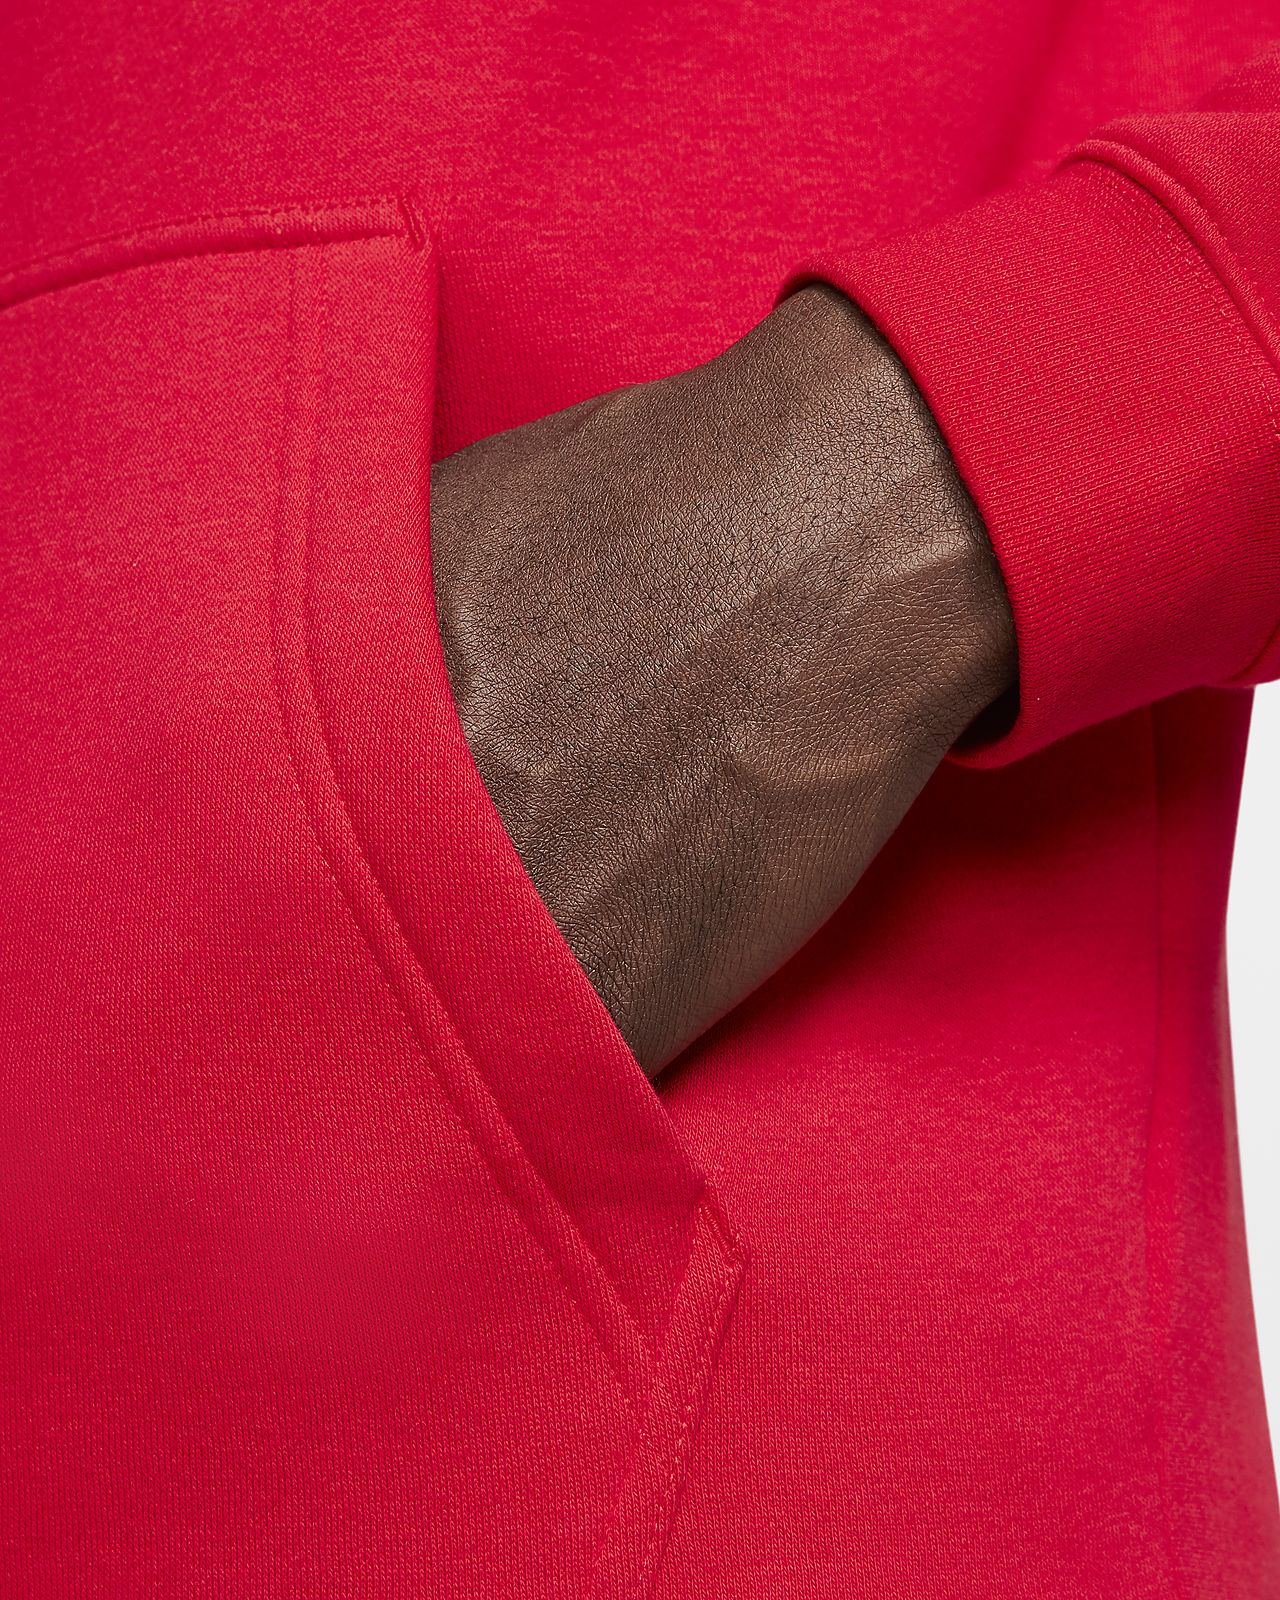 bluza nike chicago bulls nba av0322 rozmiarówka